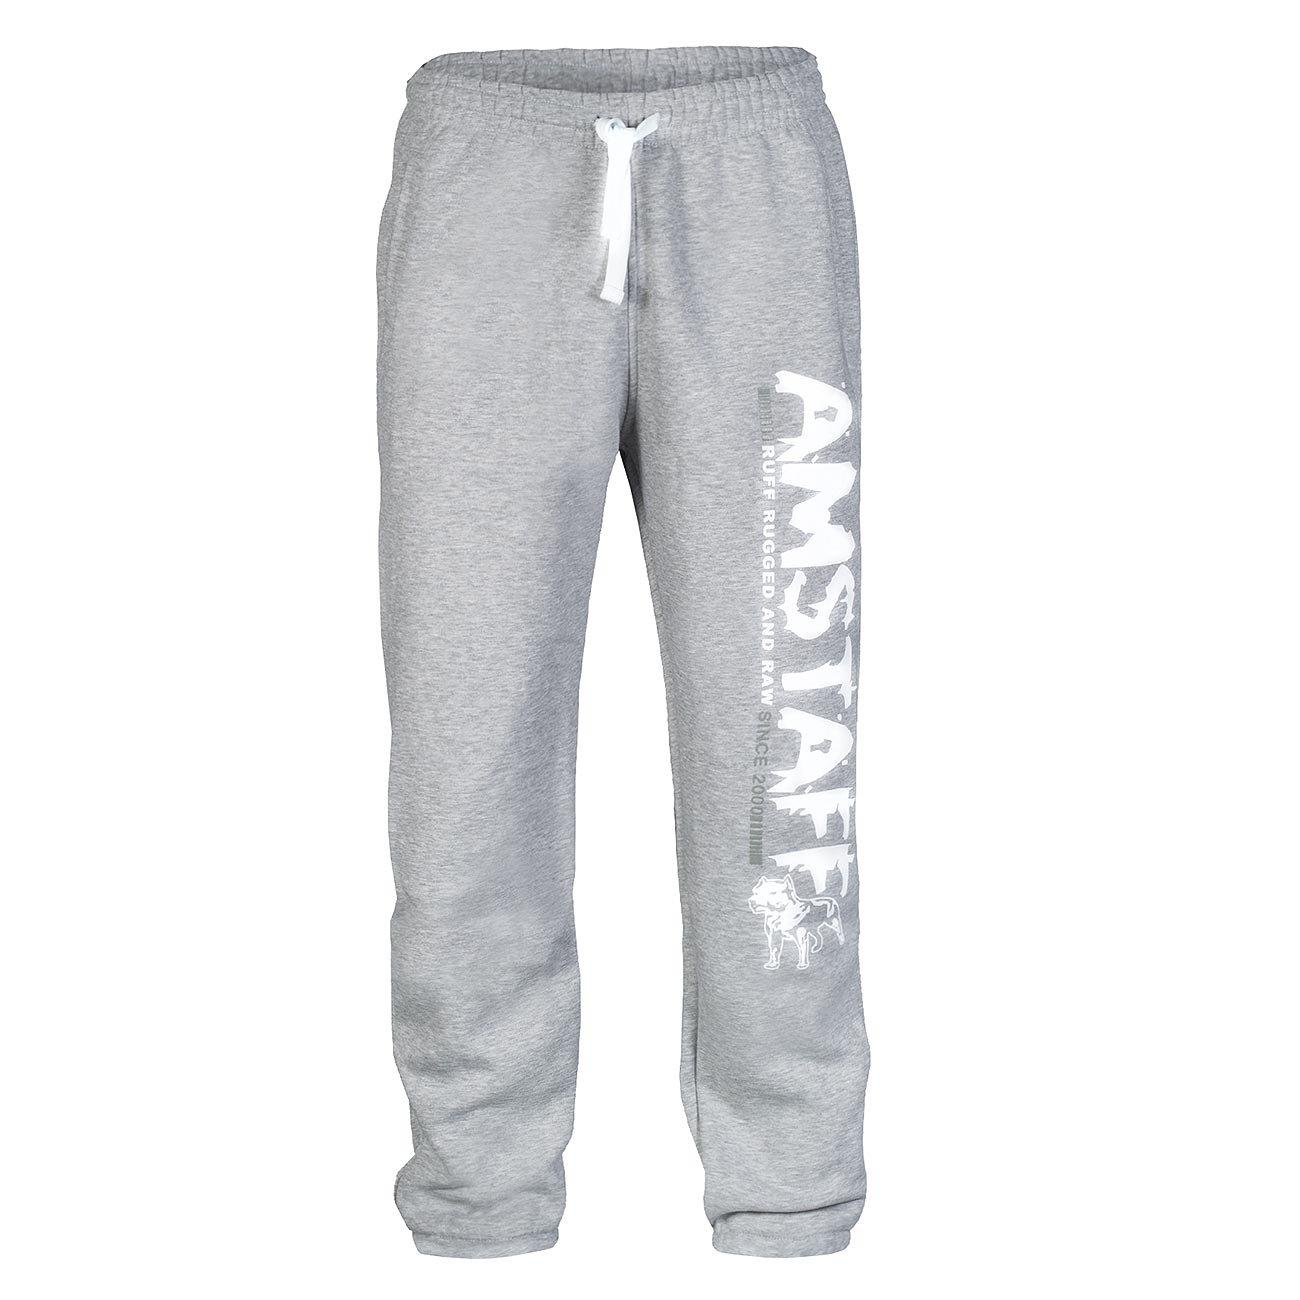 Amstaff Blade Sweatpants - Grau Herren Jogginghose Größe S M L XL XXL 3XL